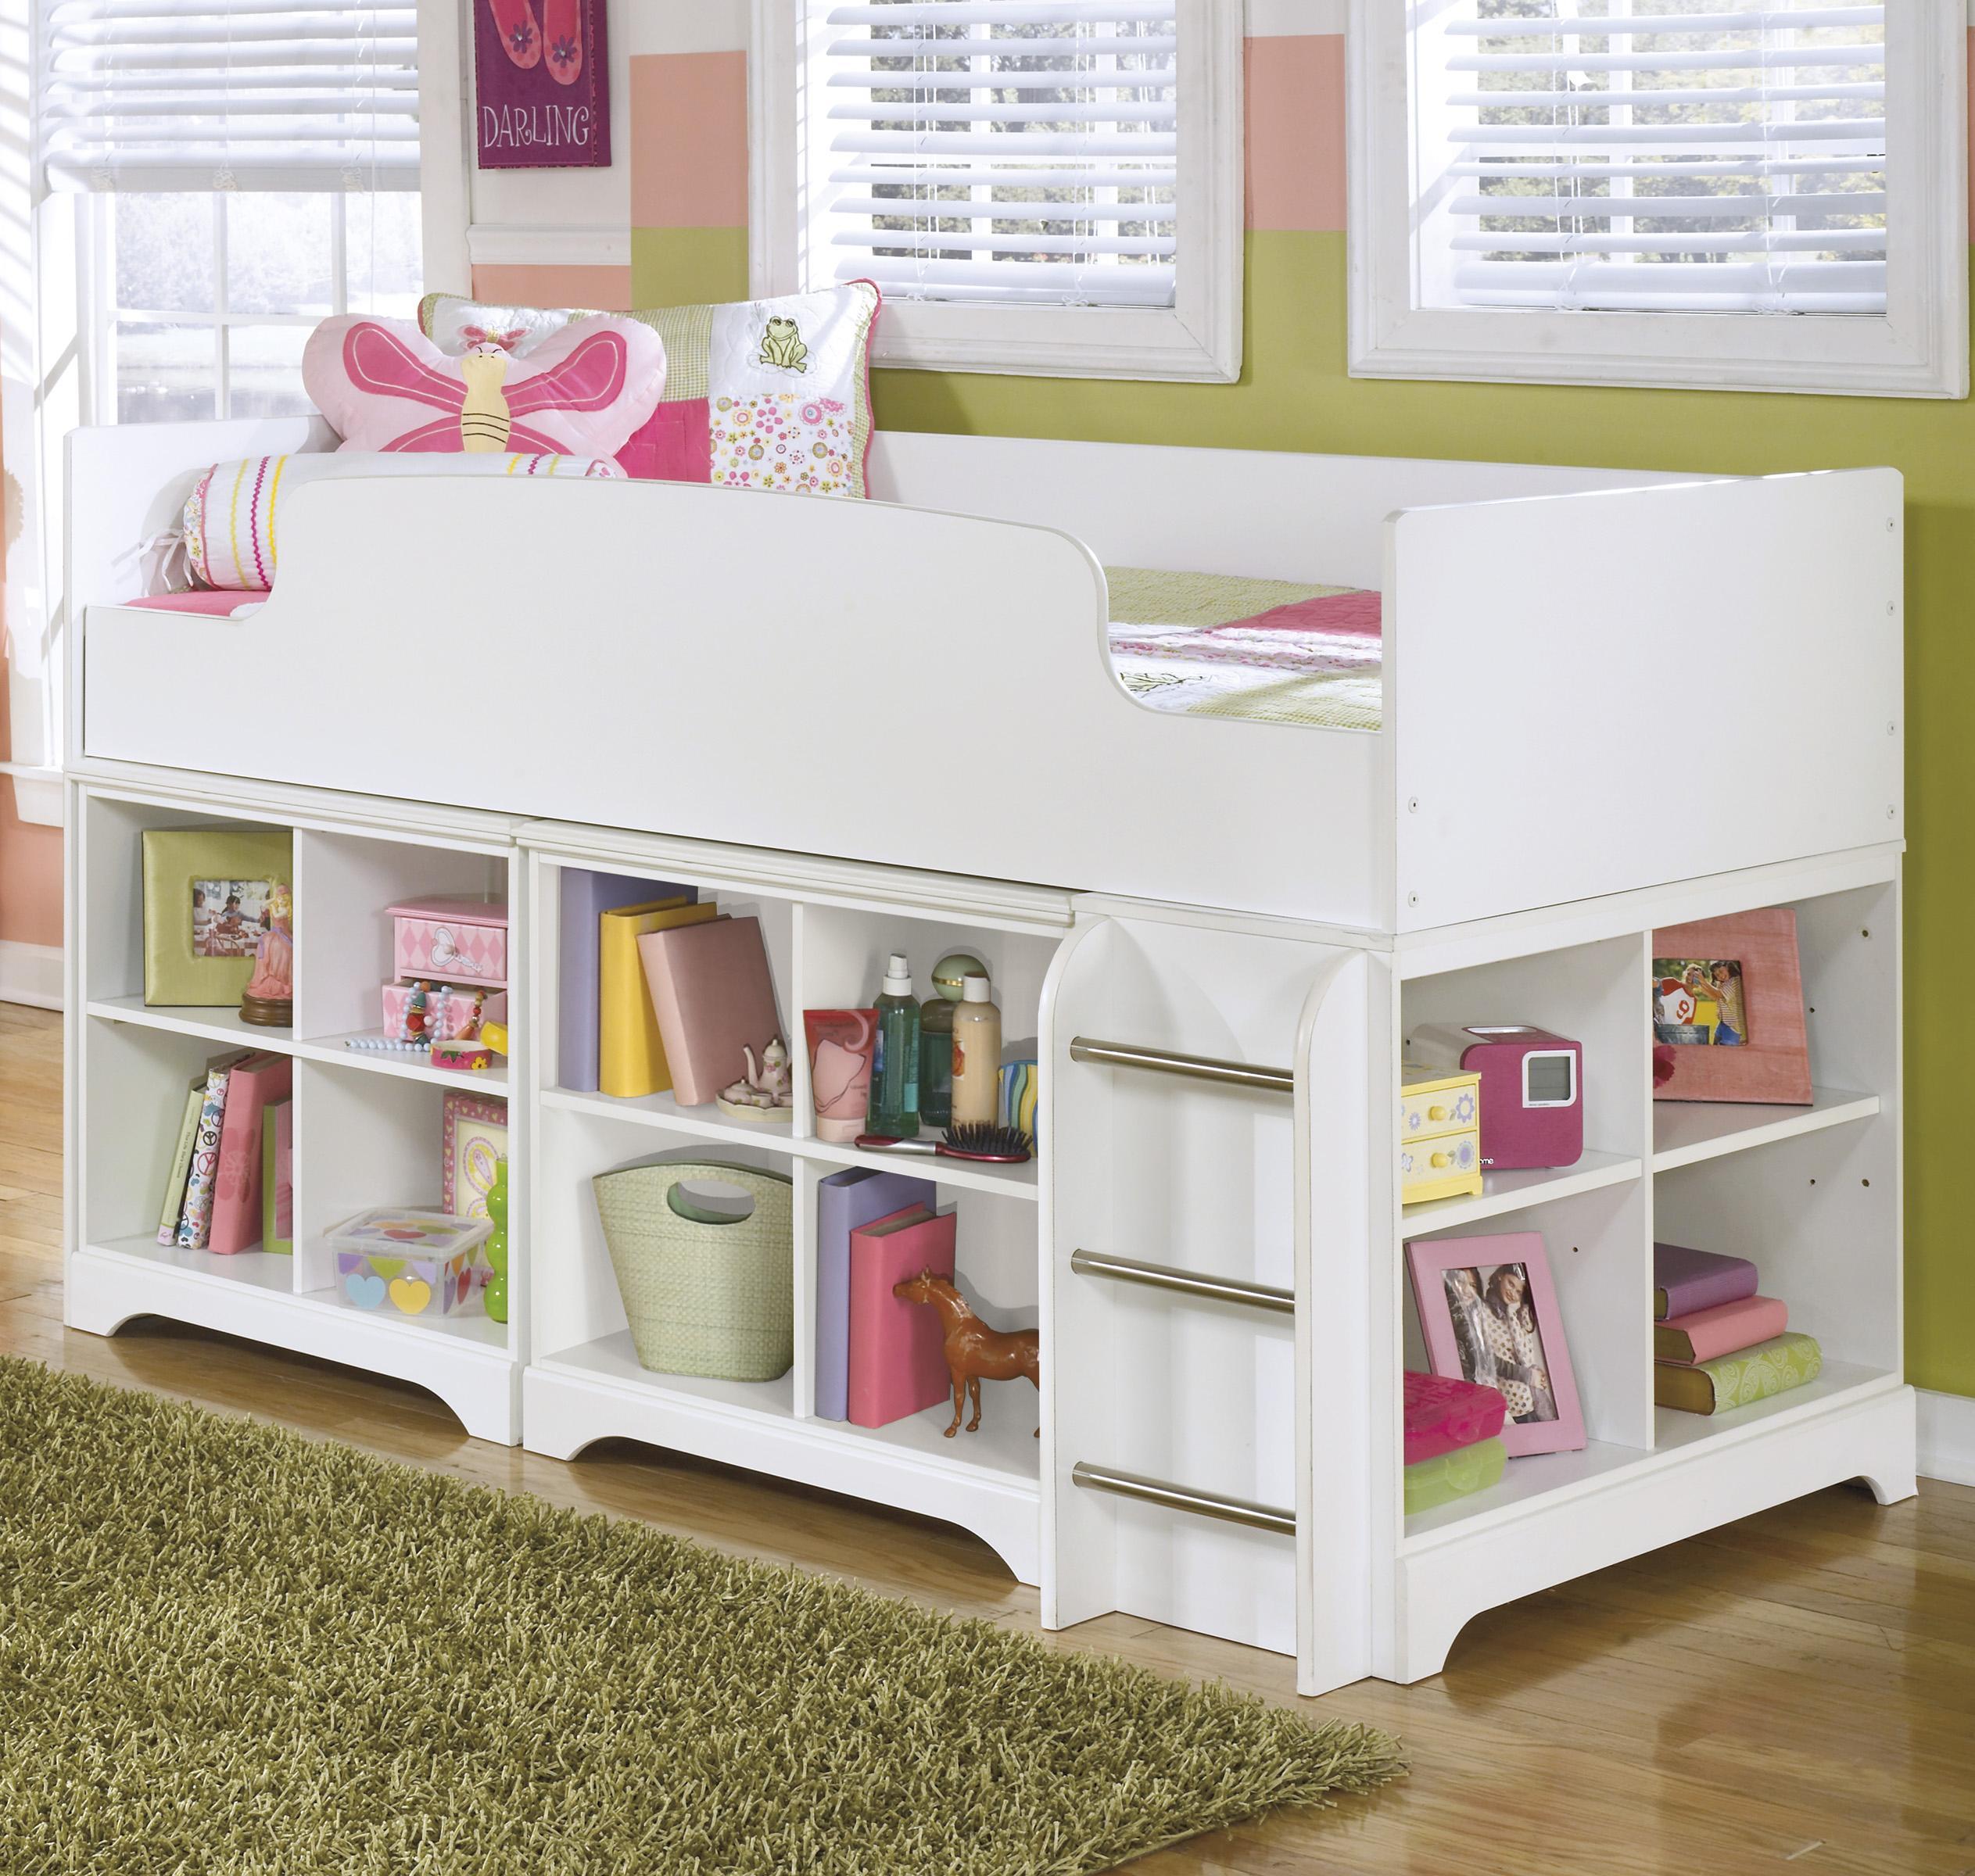 Signature Design by Ashley Lulu Twin Loft Bed with Loft Bin Storage - Item Number: B102-68T+2x16+17+B100-11